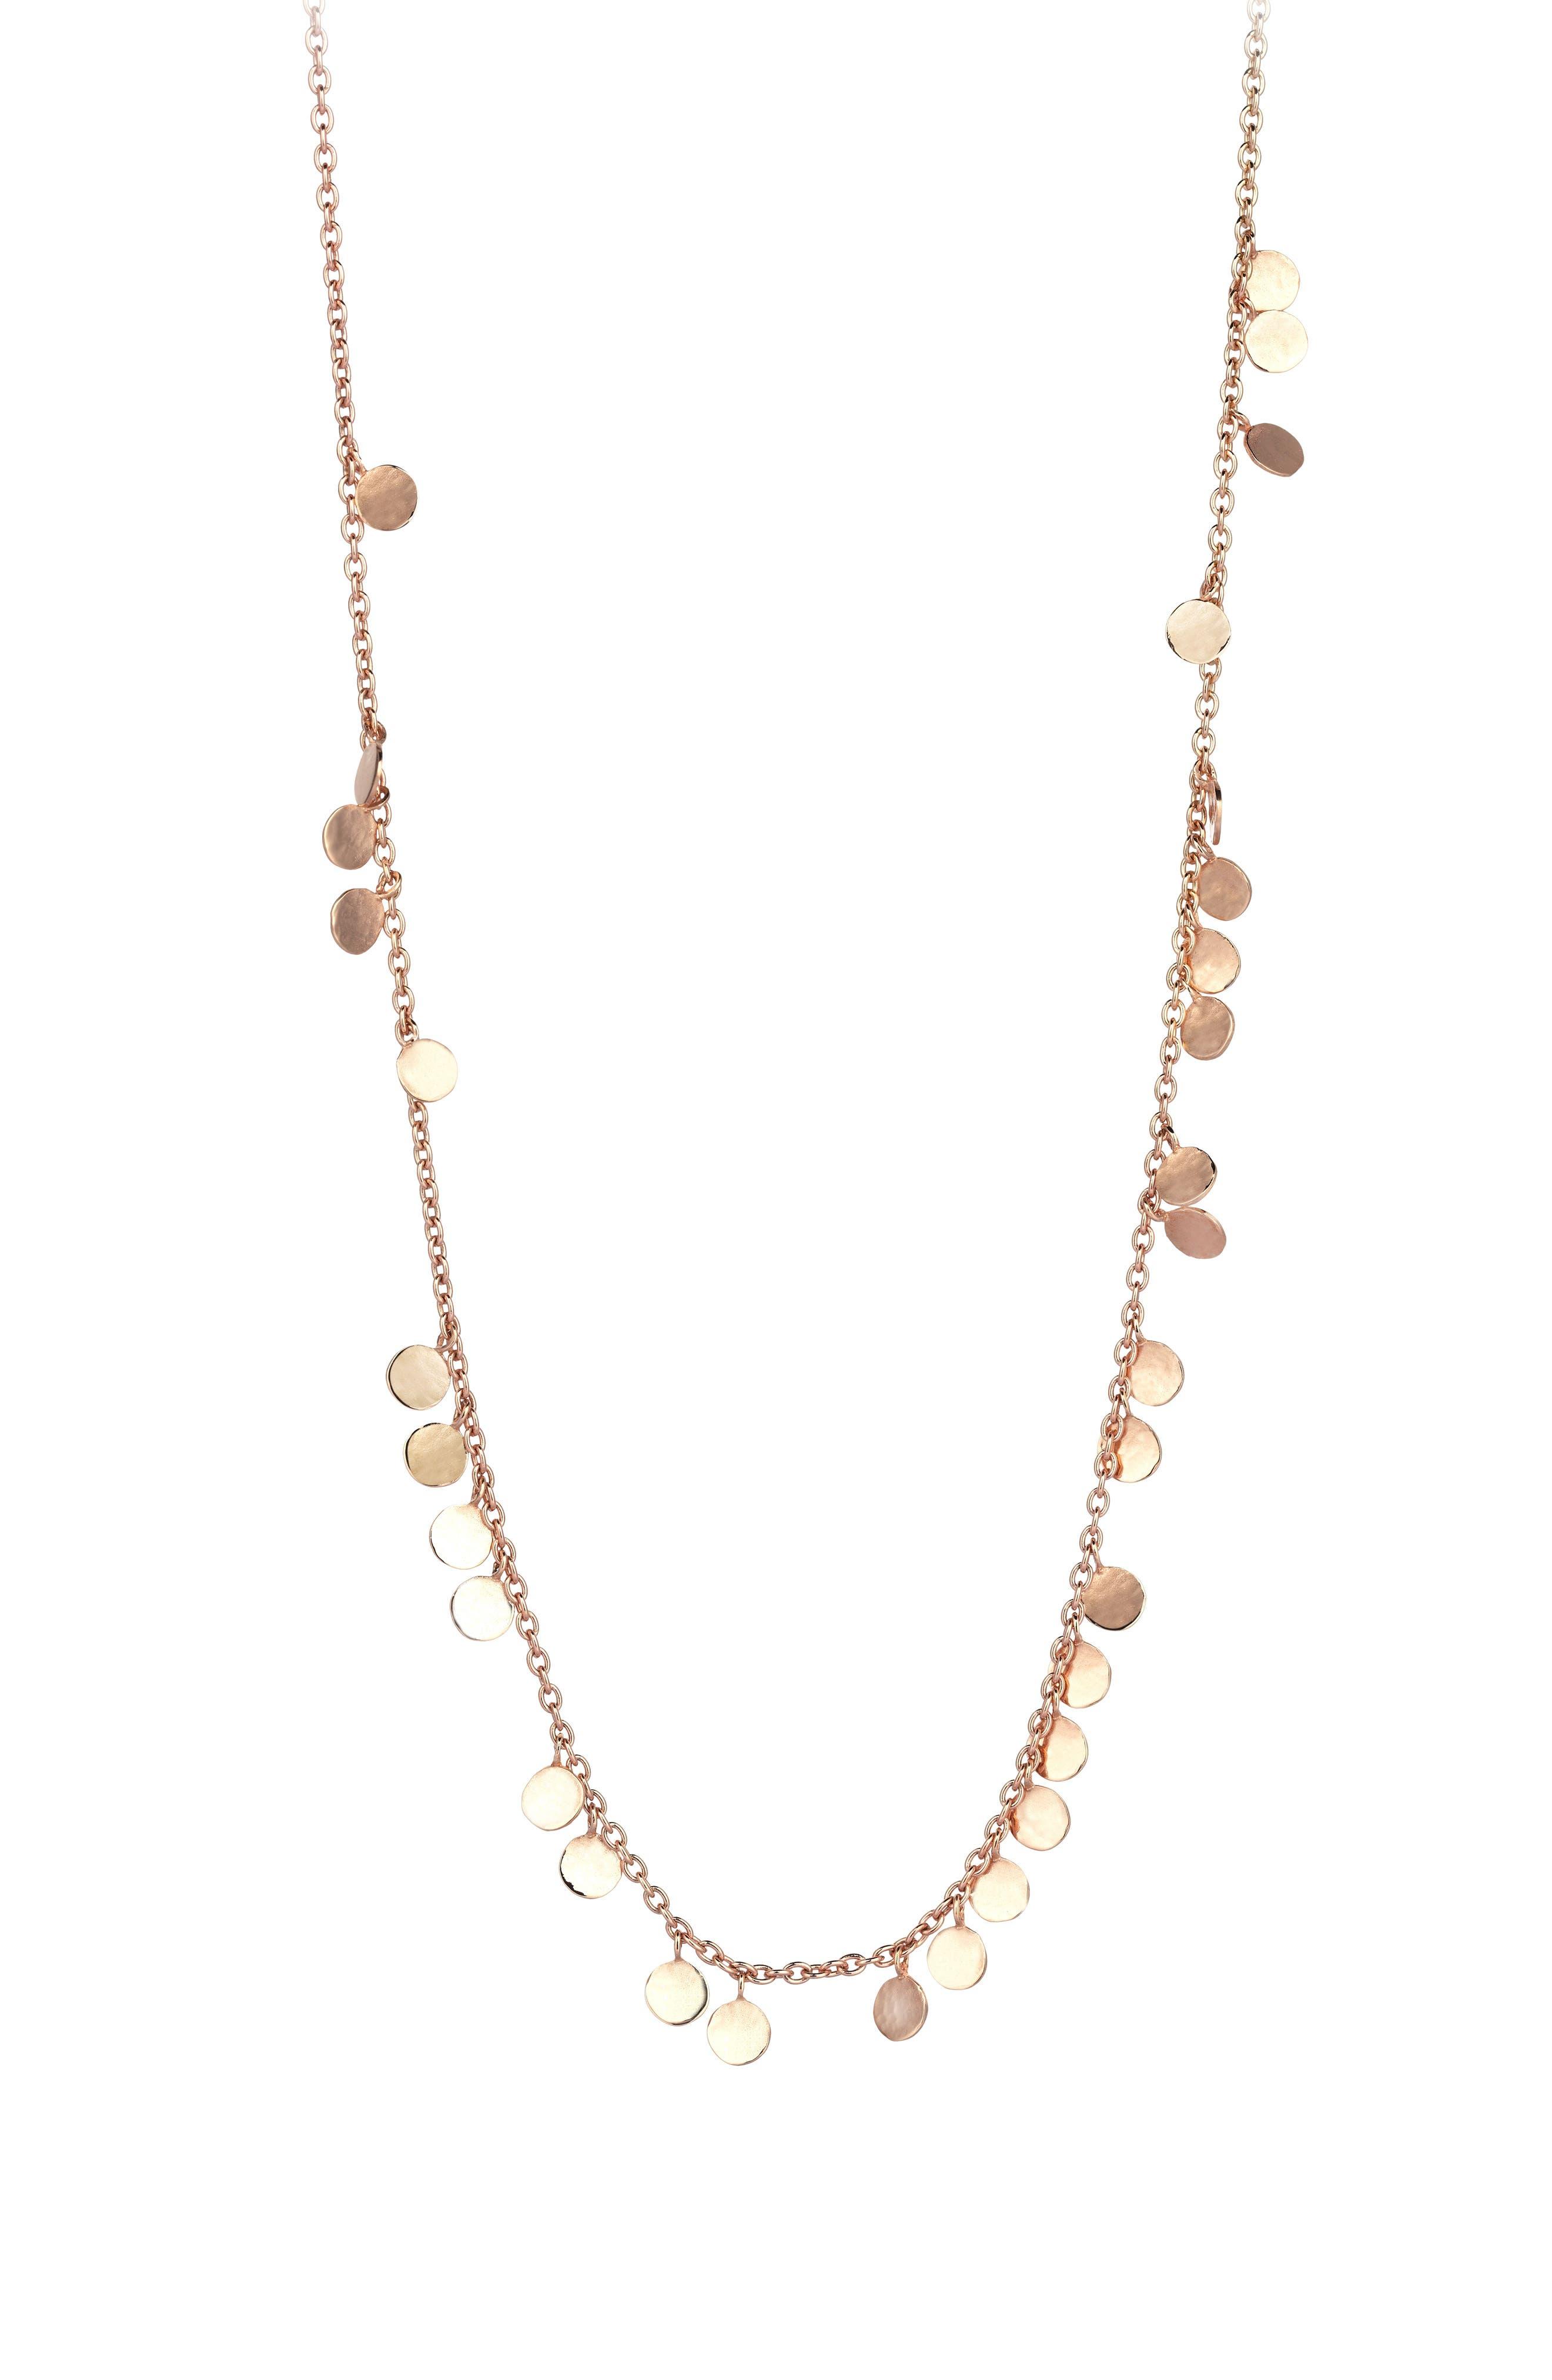 Dangling Circles Pendant Necklace,                             Main thumbnail 1, color,                             ROSE GOLD